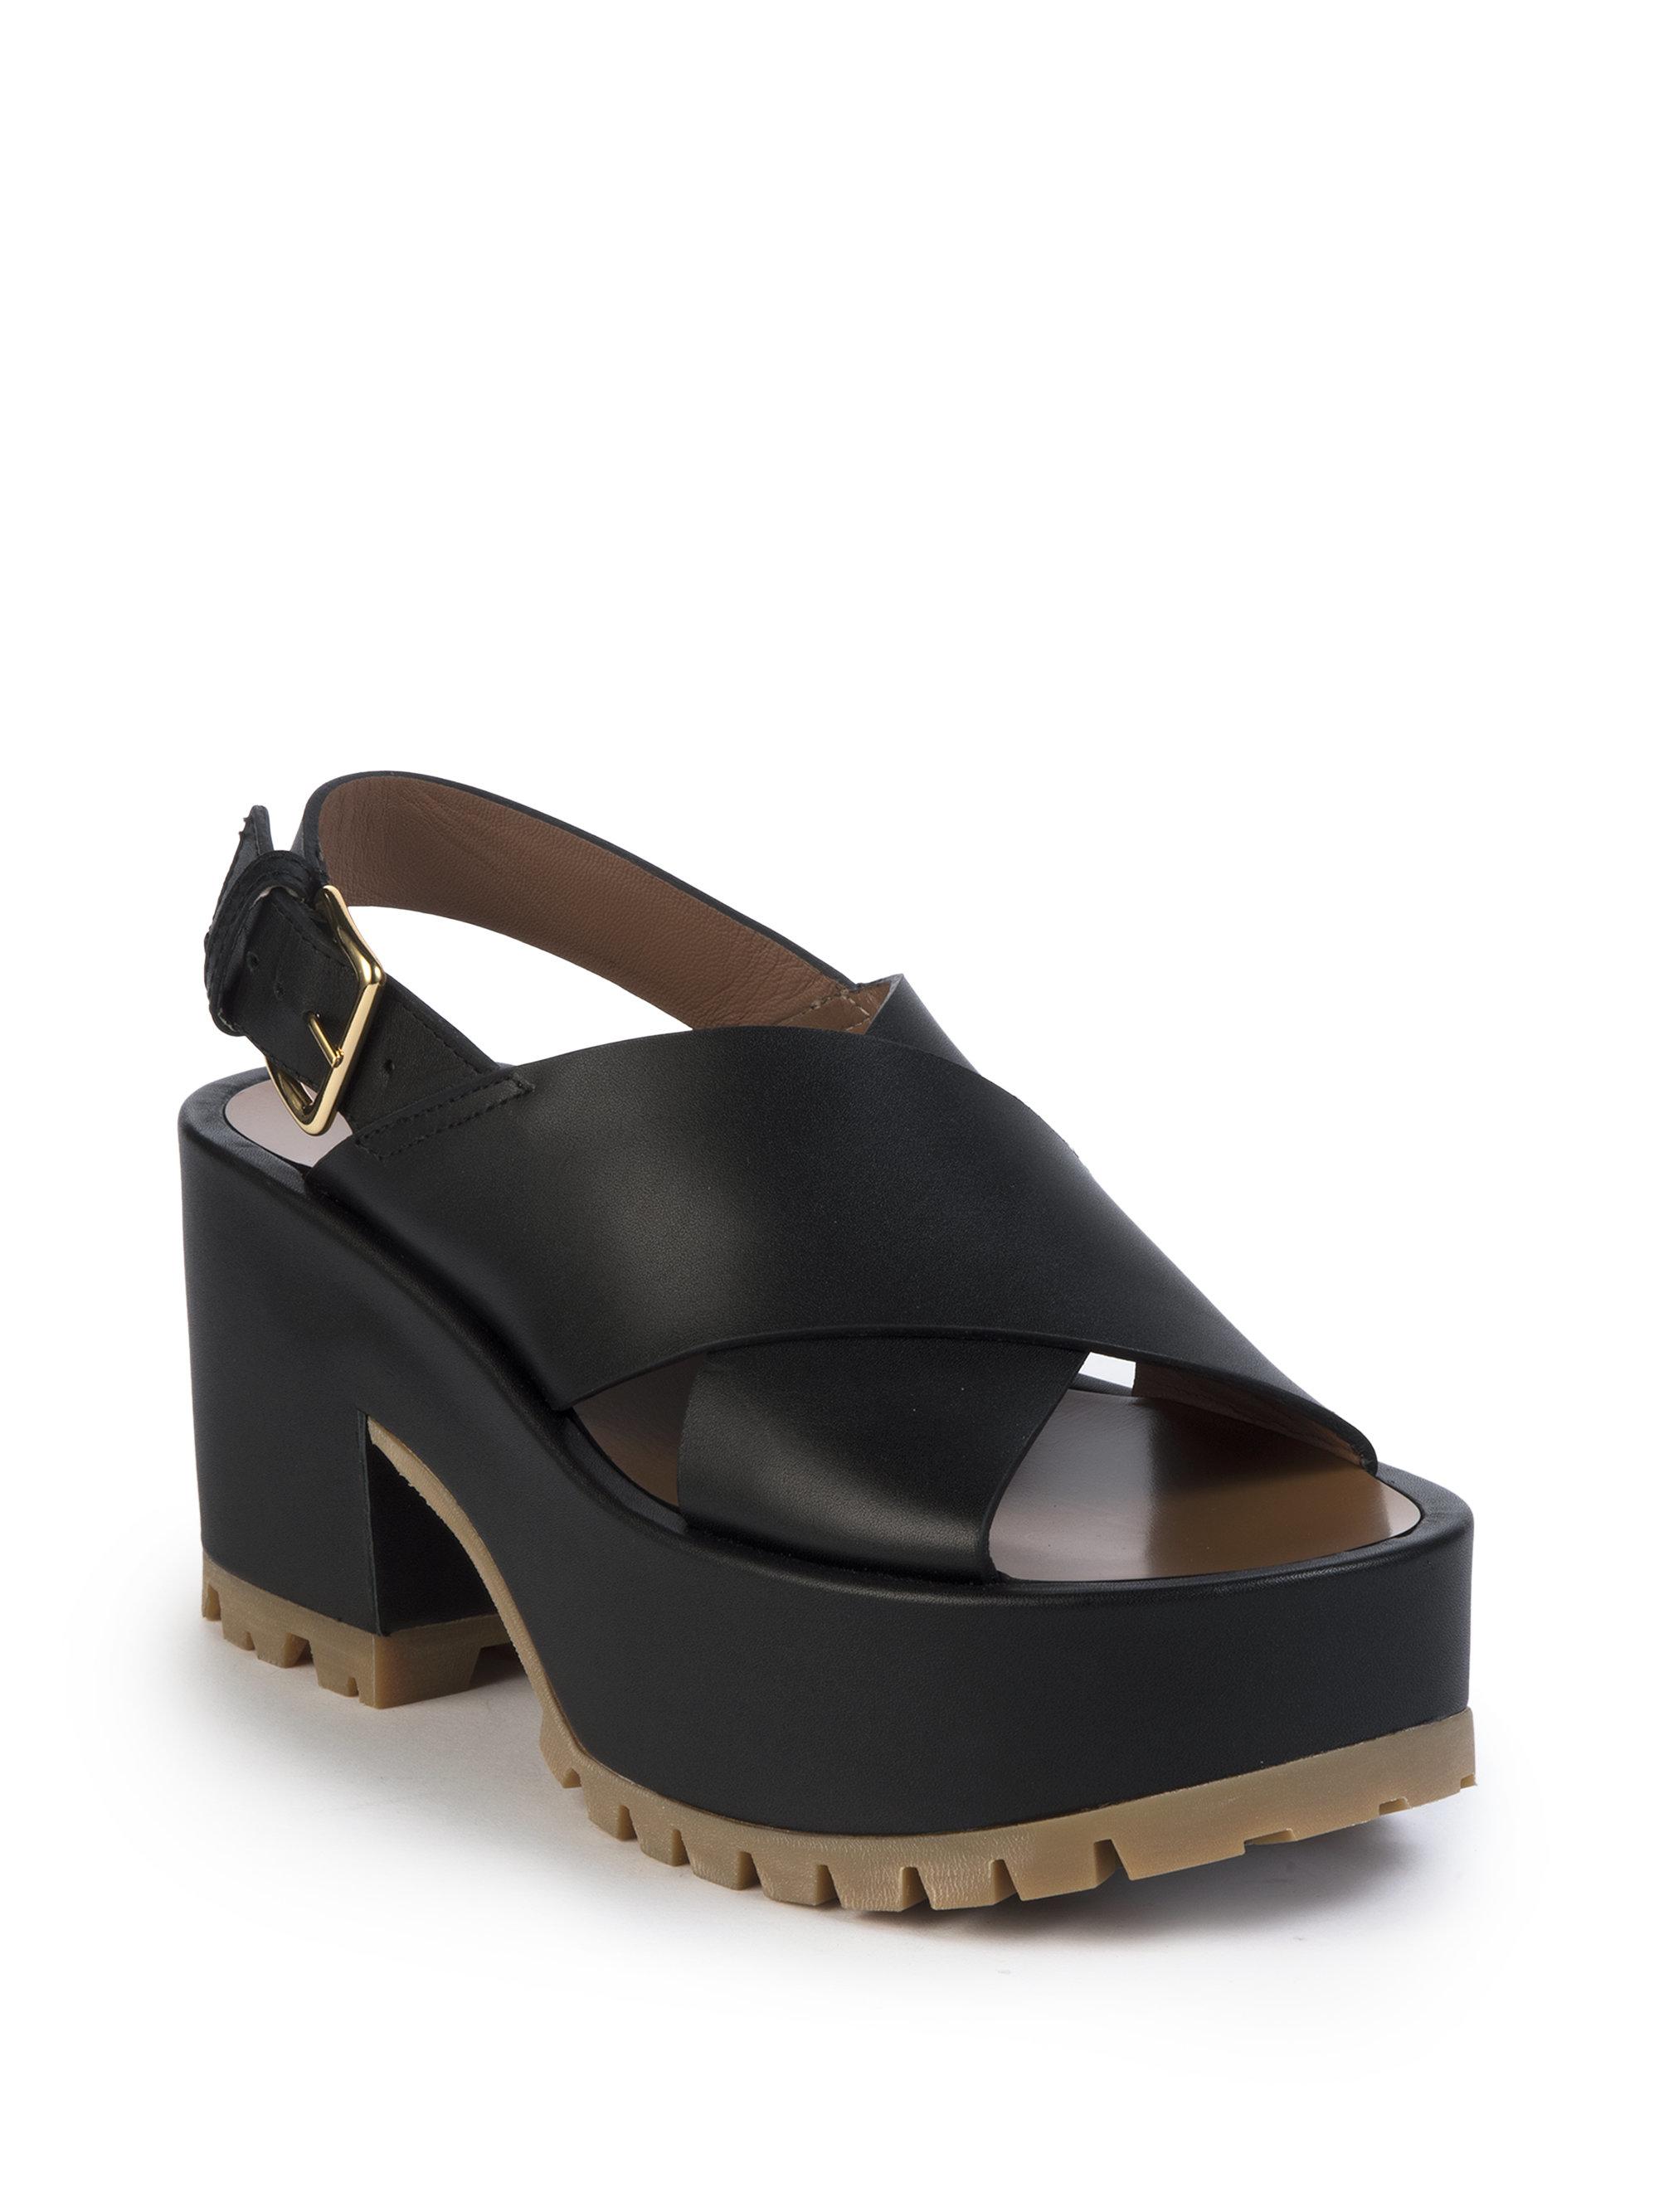 Marni Leather Platform Sandals Cheap Price Original Fashionable Cheap Price NOfTG7